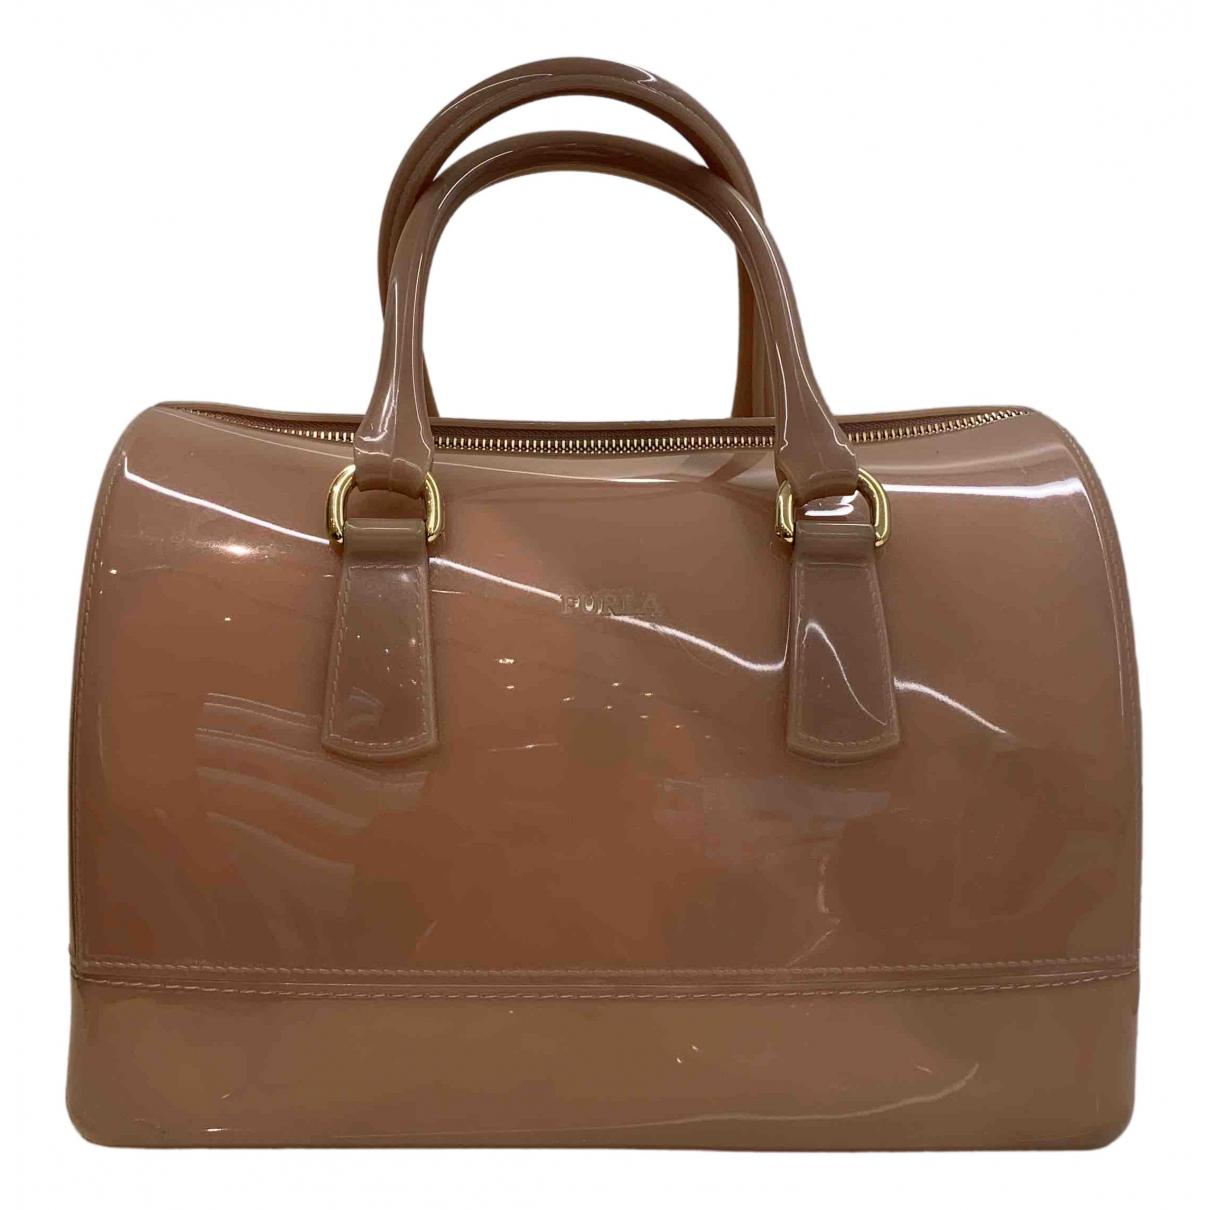 Furla Candy Bag Pink handbag for Women N